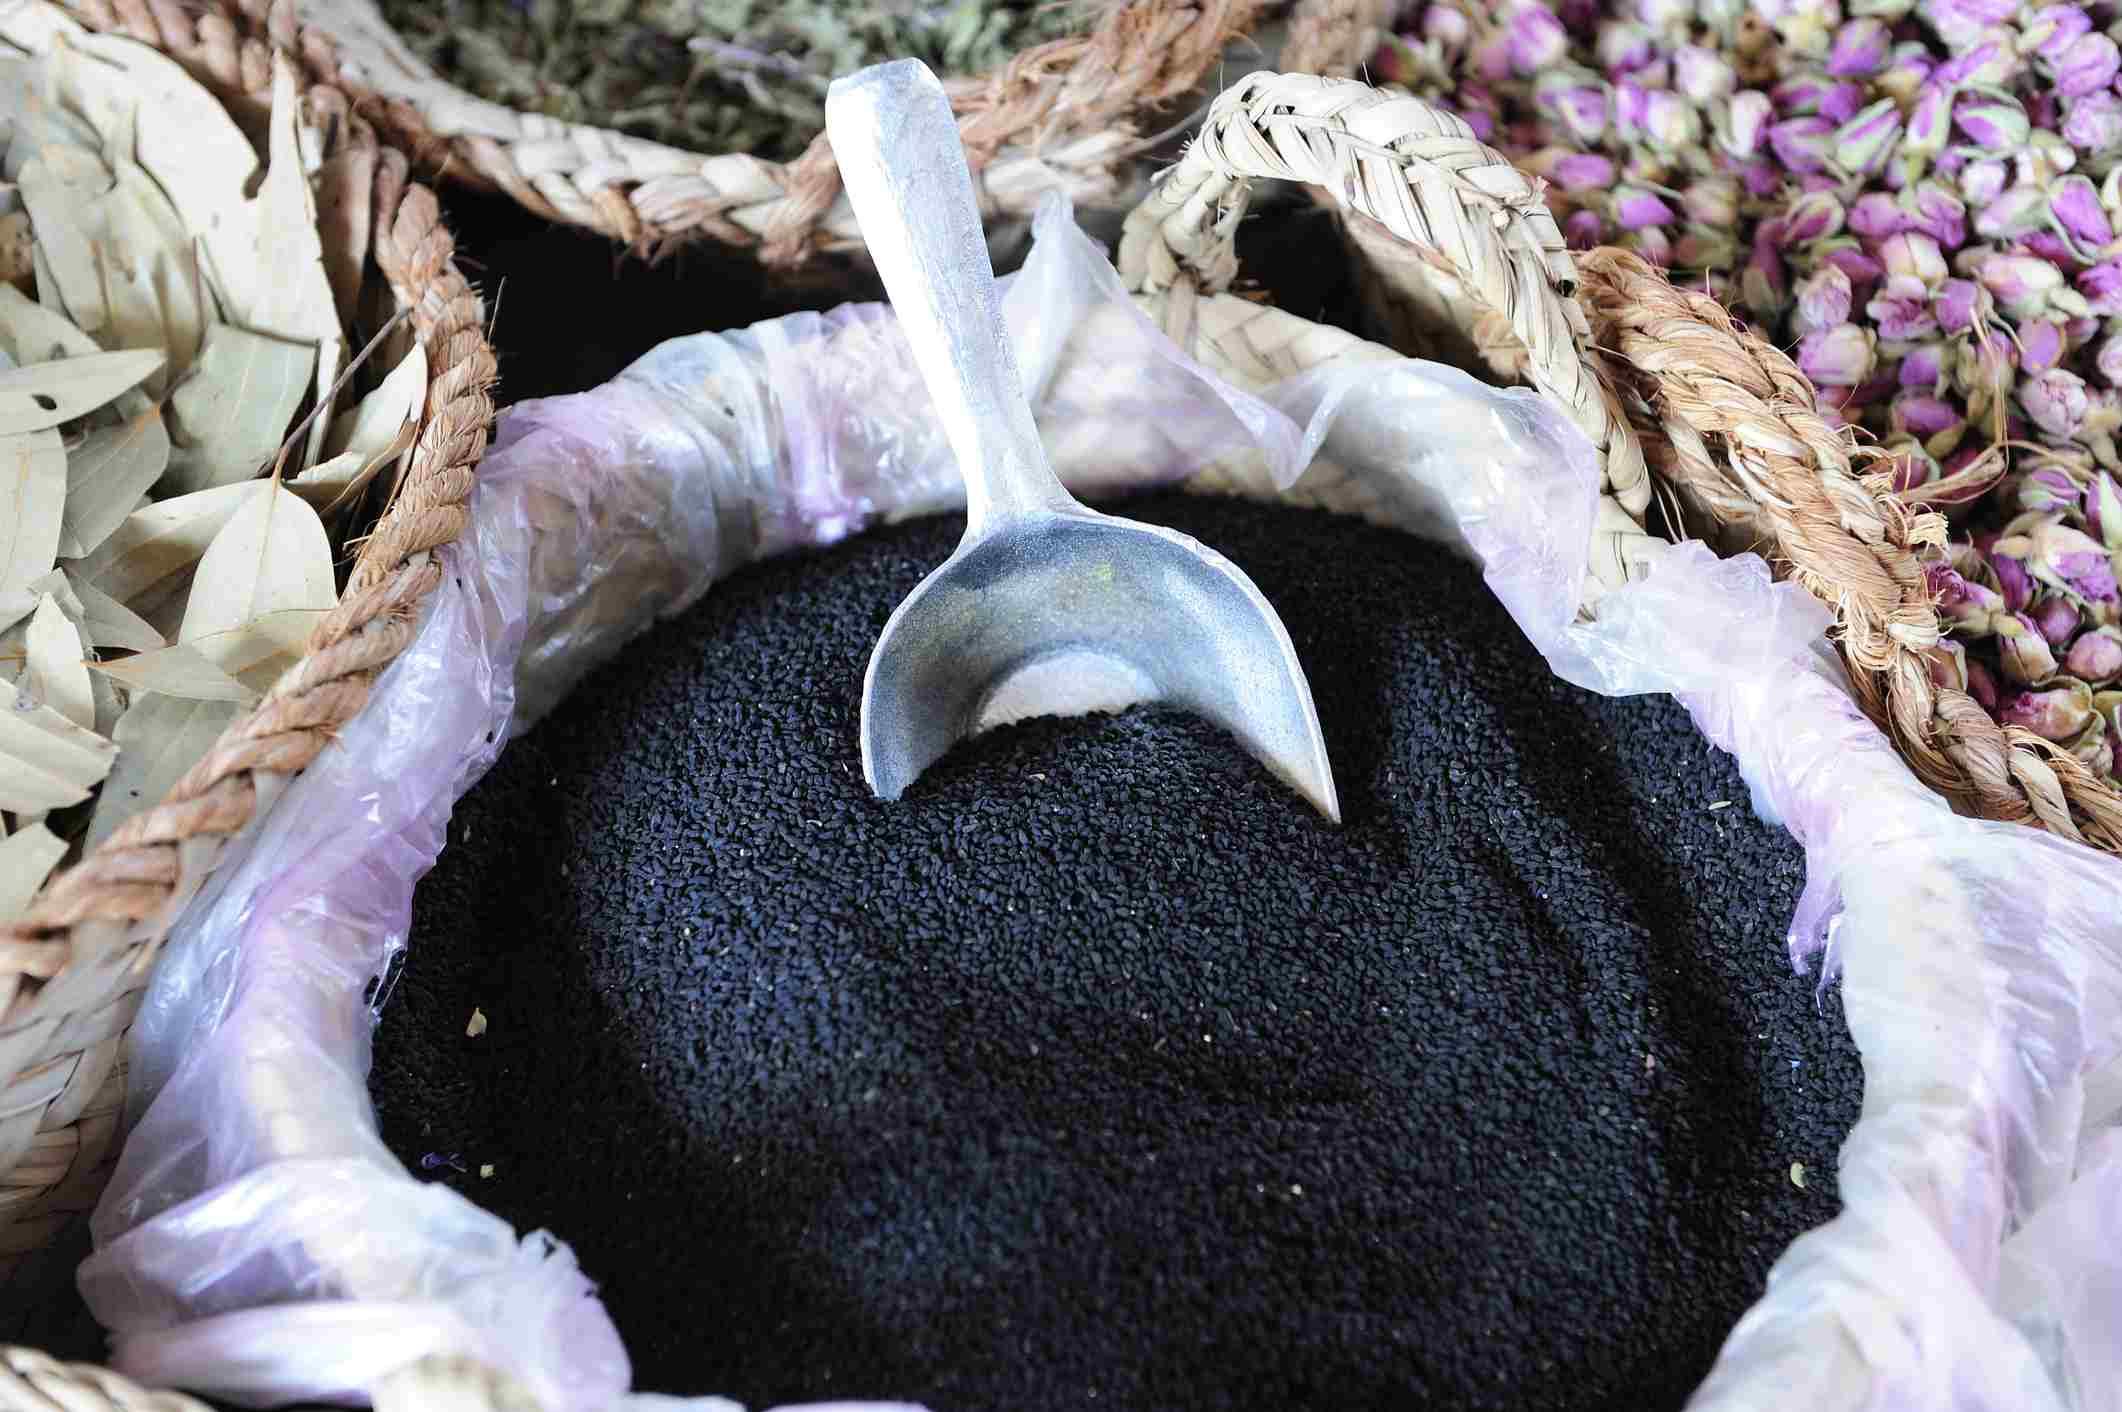 Nigella seeds in a large basket